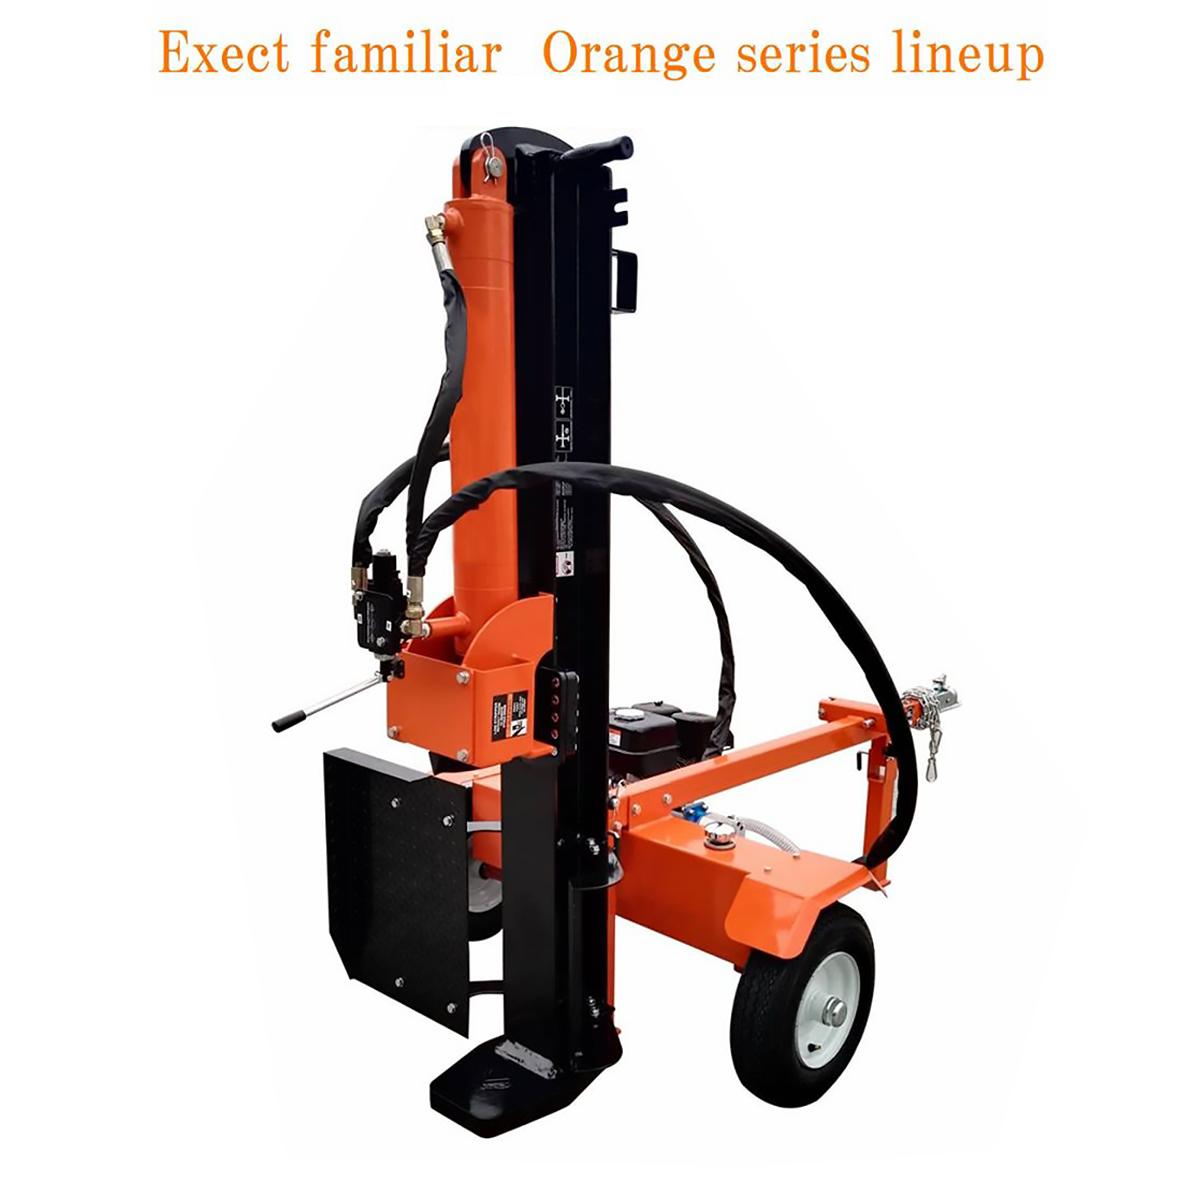 Exectfamiliar Orangeseries 2年間保証 エンジン薪割り機 27t 重量285kg OHV6.5馬力 最大油圧シリンダー